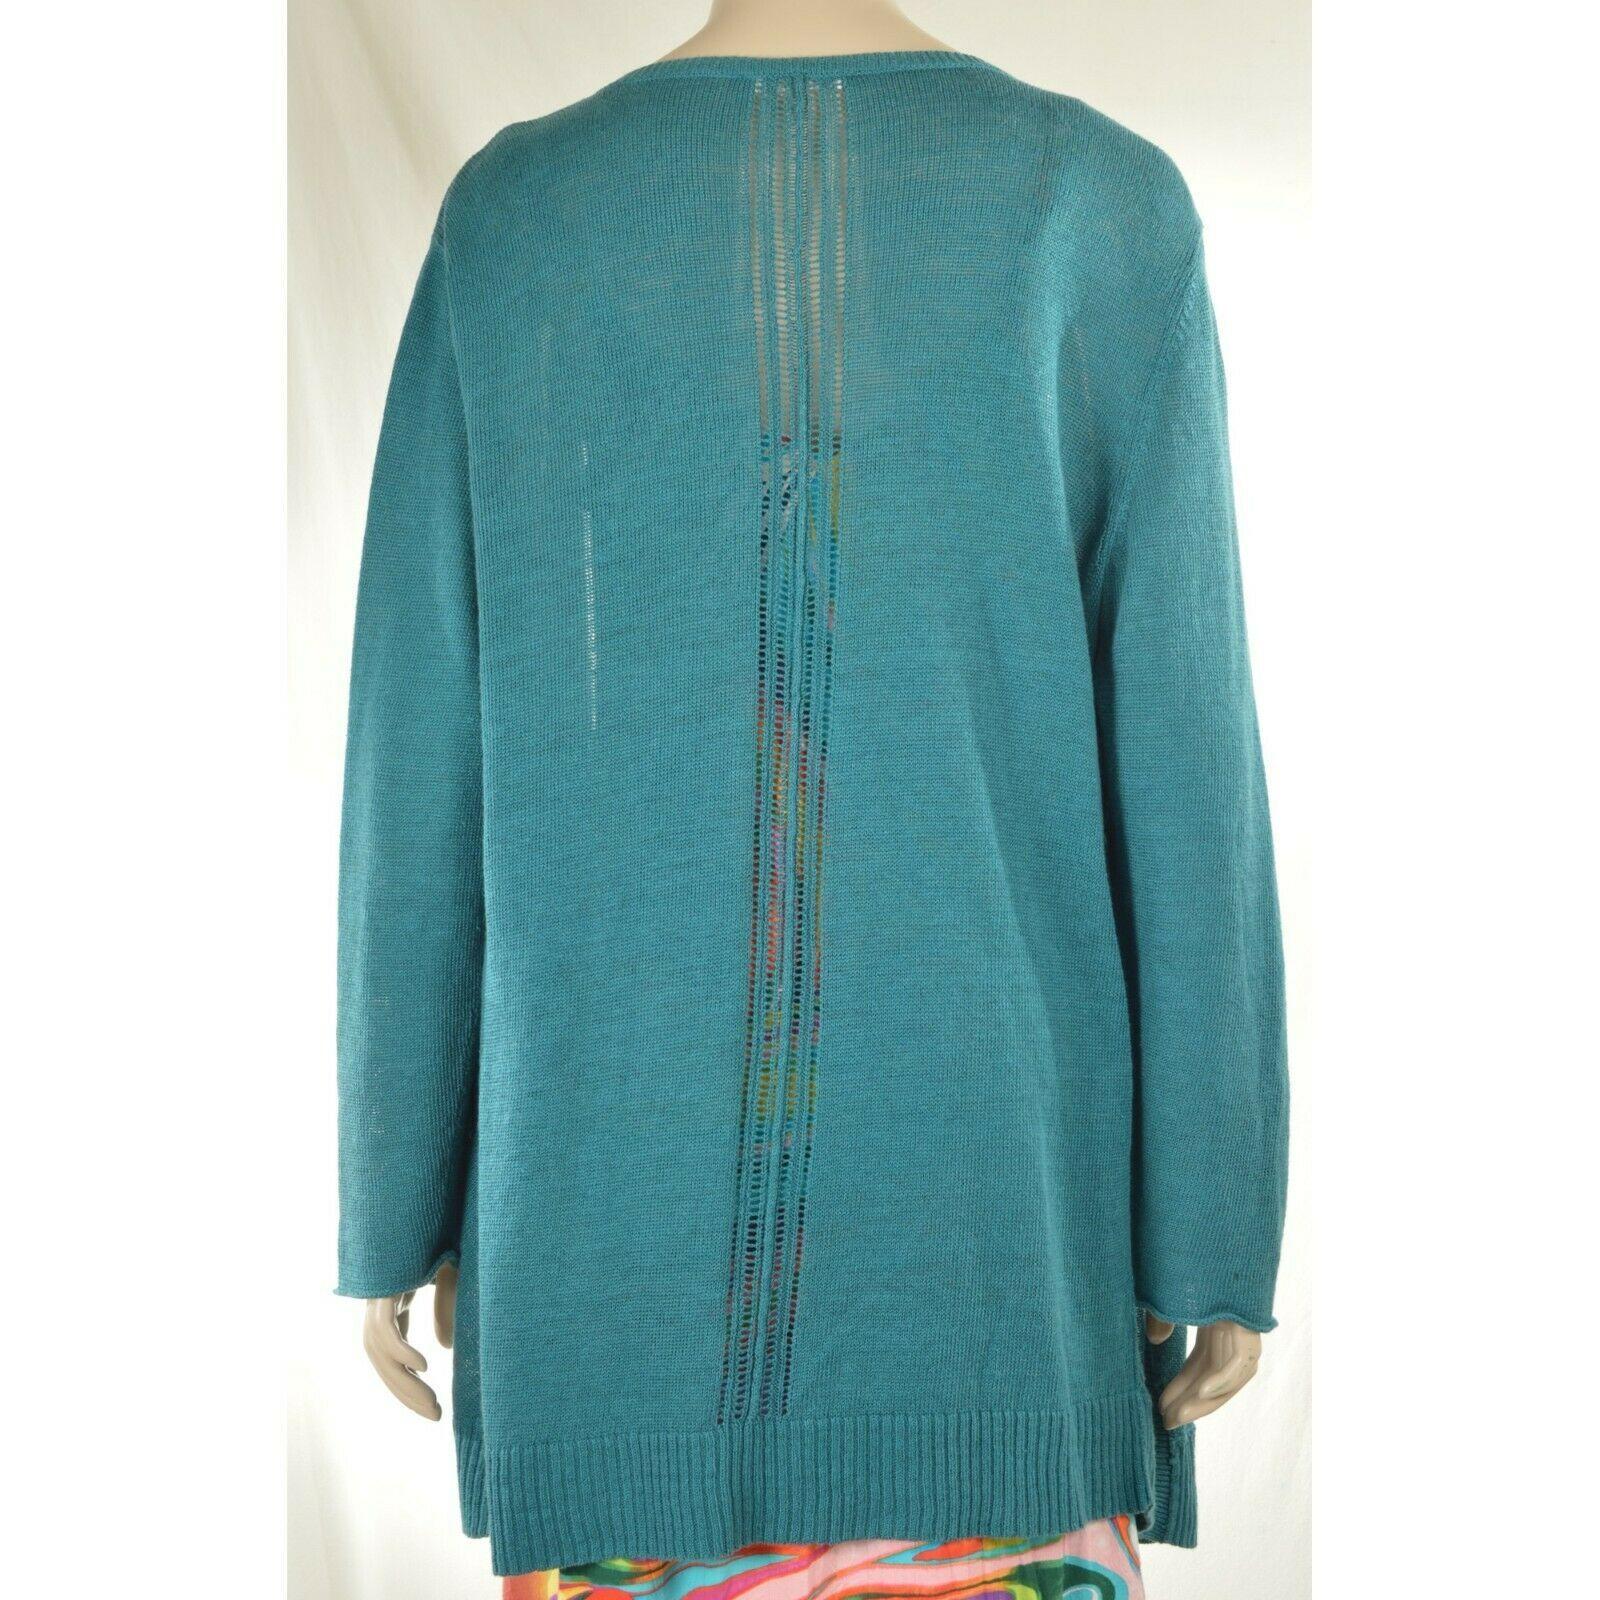 Eileen Fisher sweater cardigan SZ L teal 100% linen knit pockets soft long s image 10